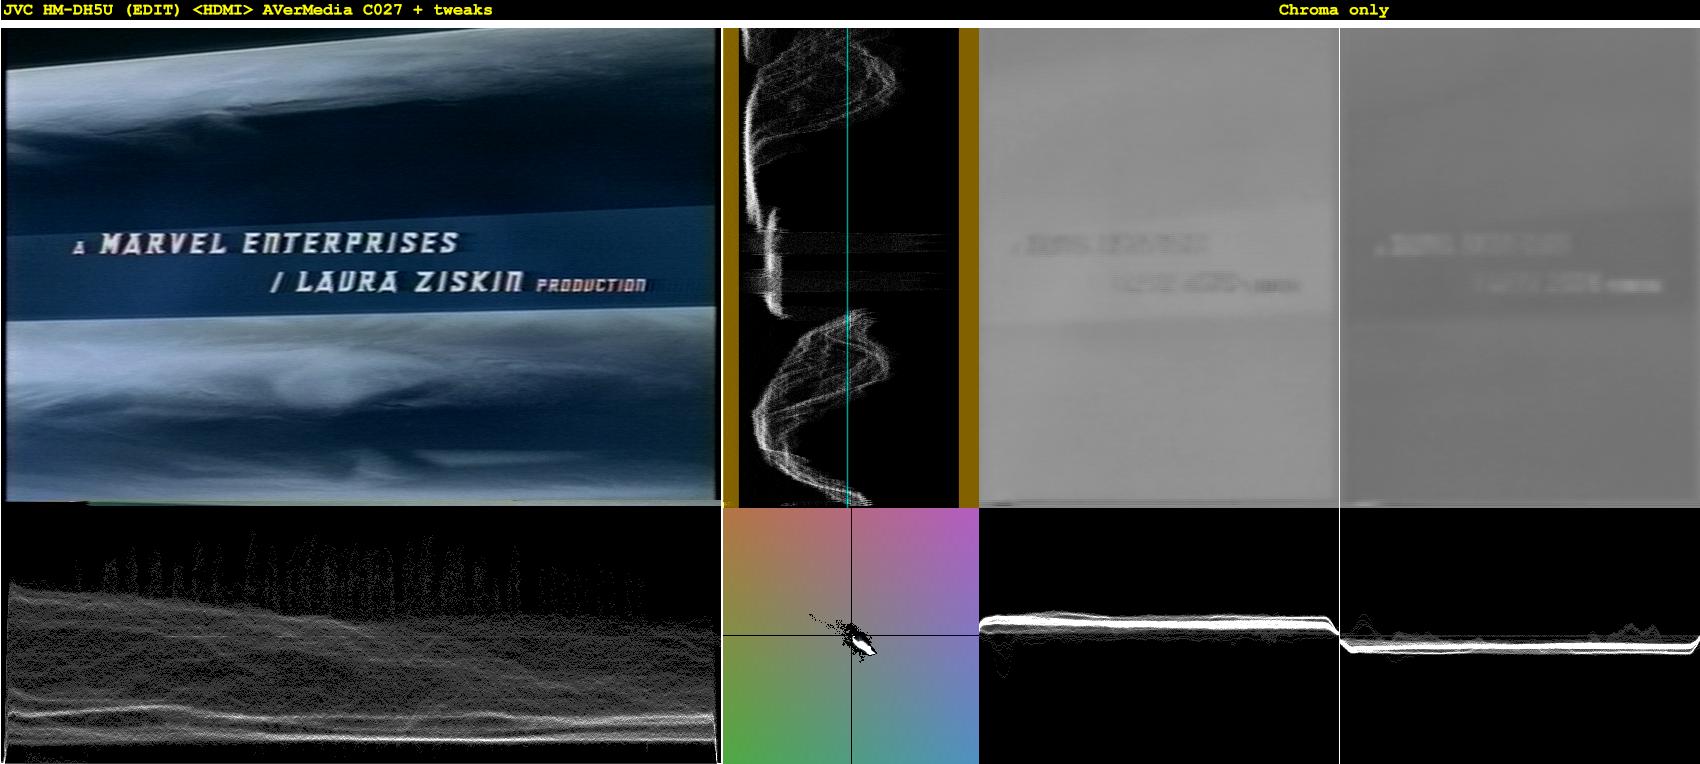 Click image for larger version  Name:0-09-01 - JVC HM-DH5U (EDIT).png Views:1311 Size:818.6 KB ID:37666